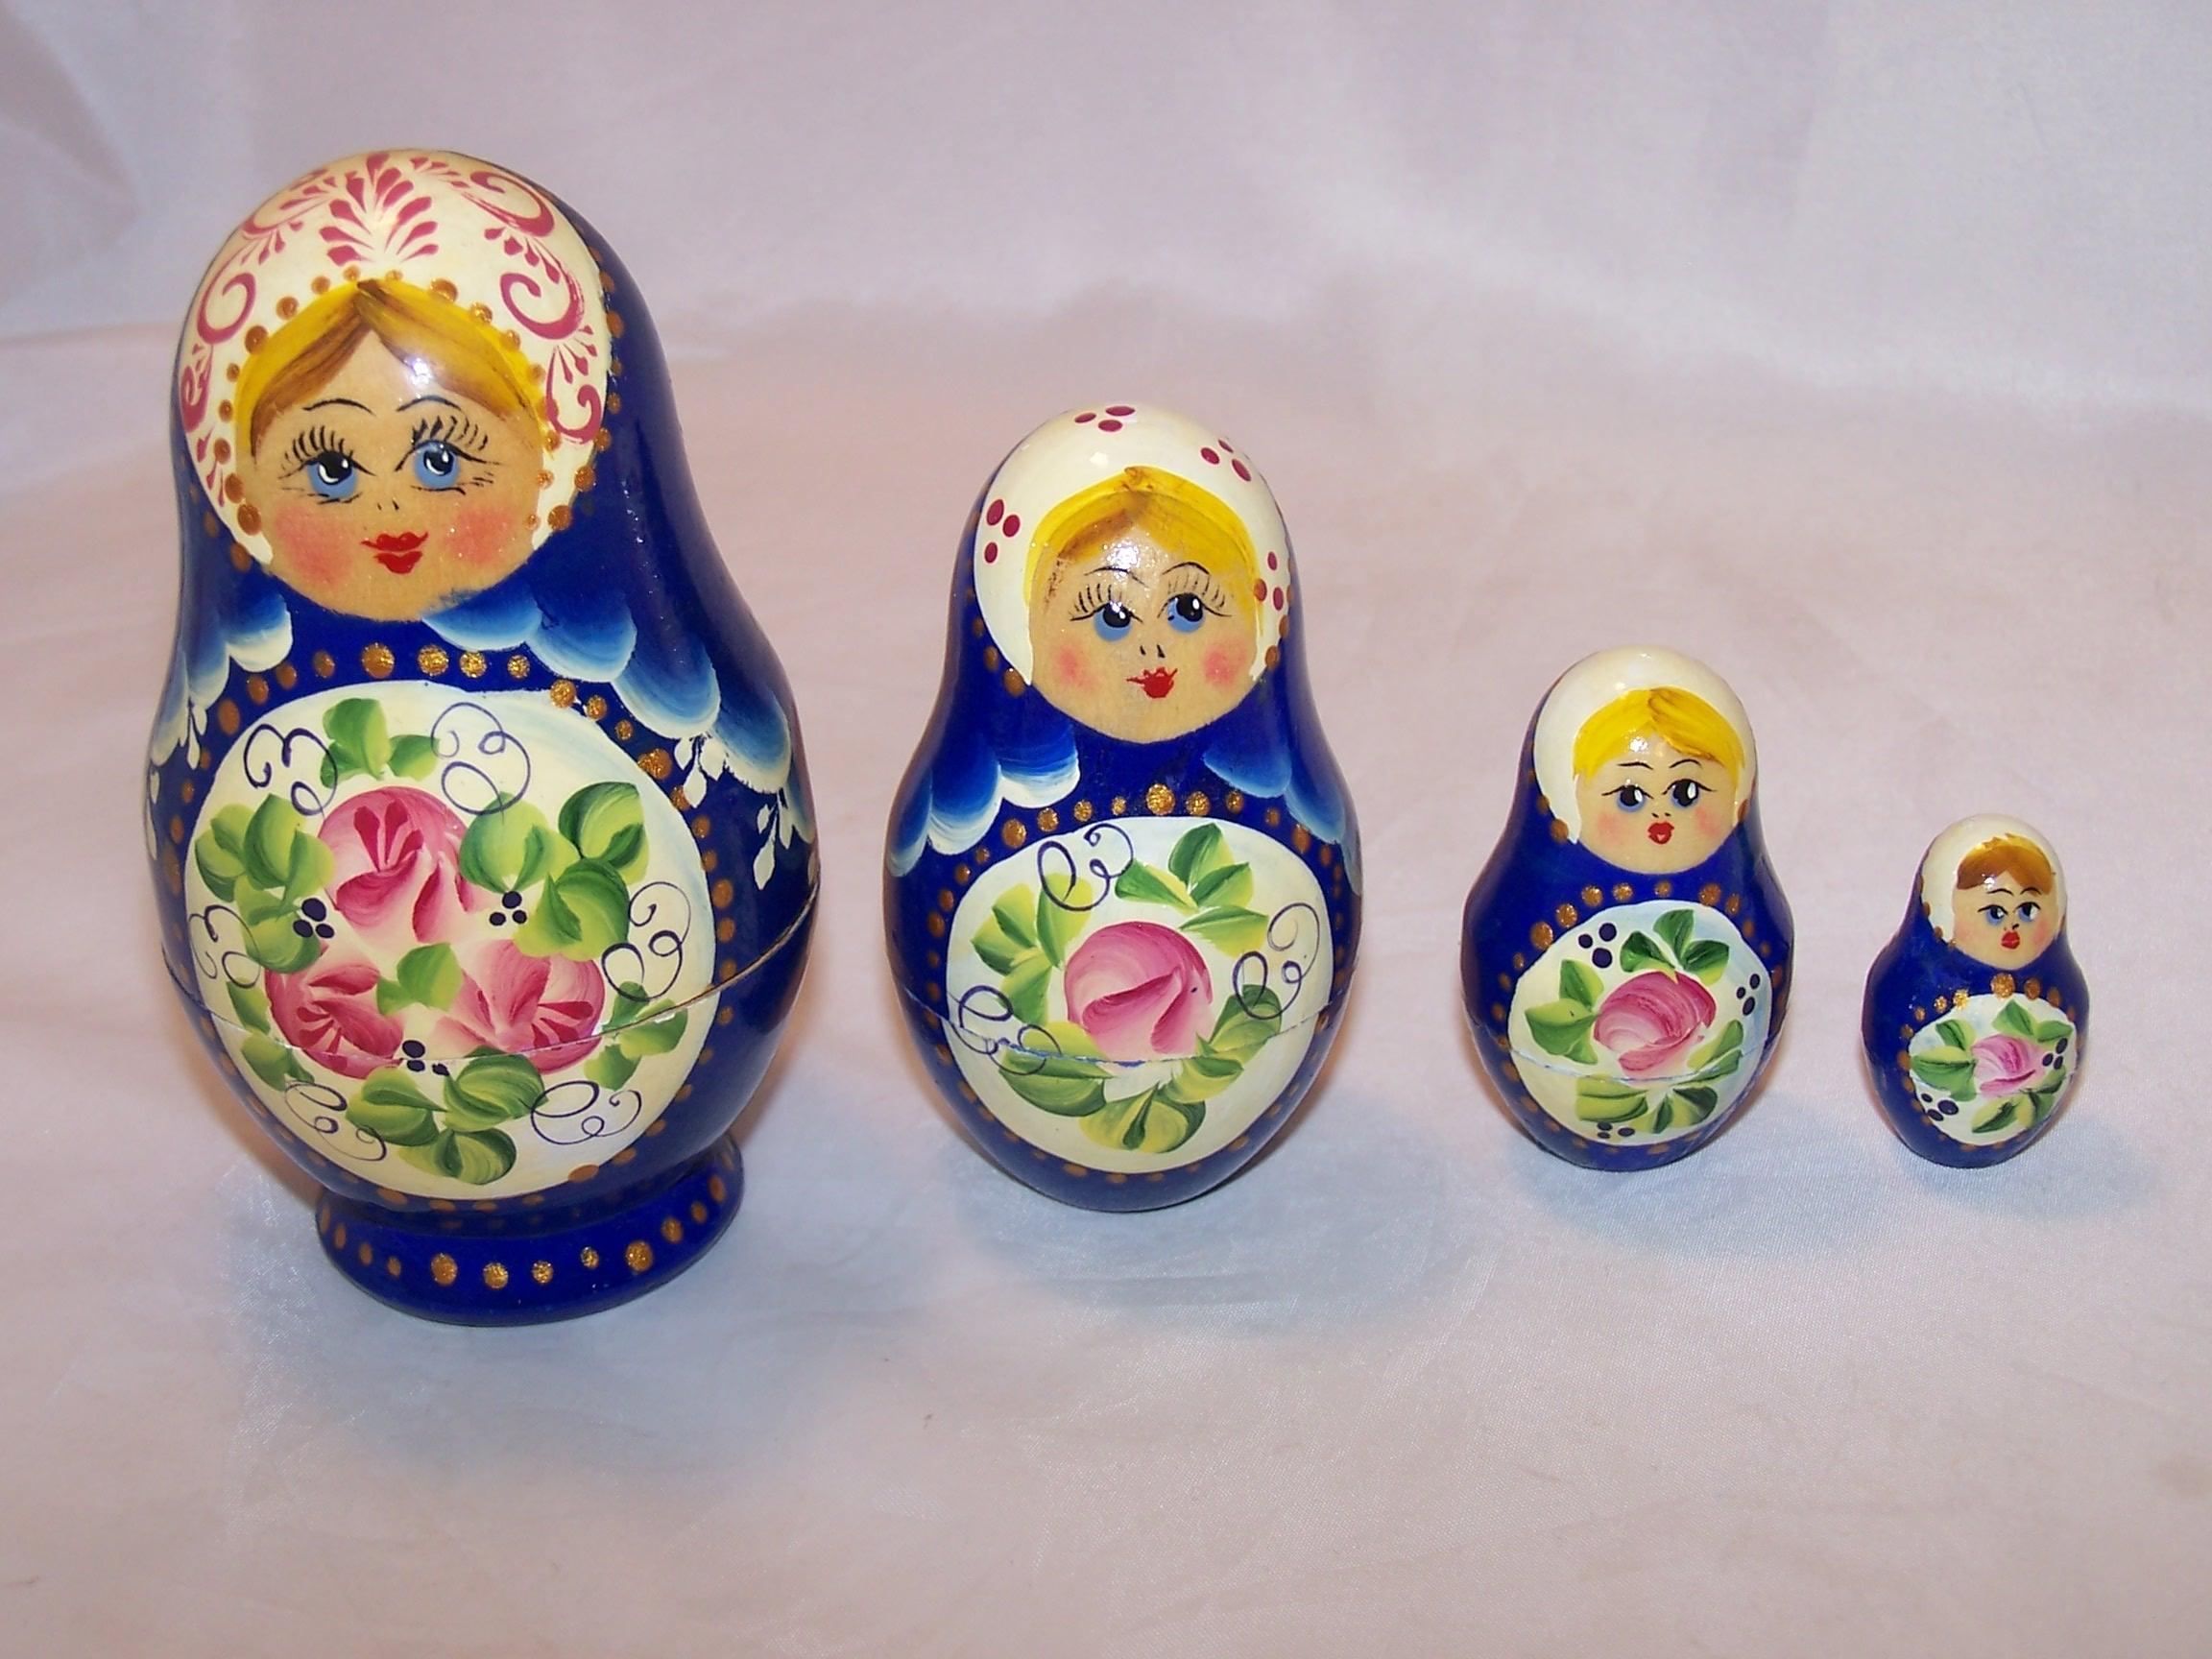 Nesting Doll in Blue, Flowers